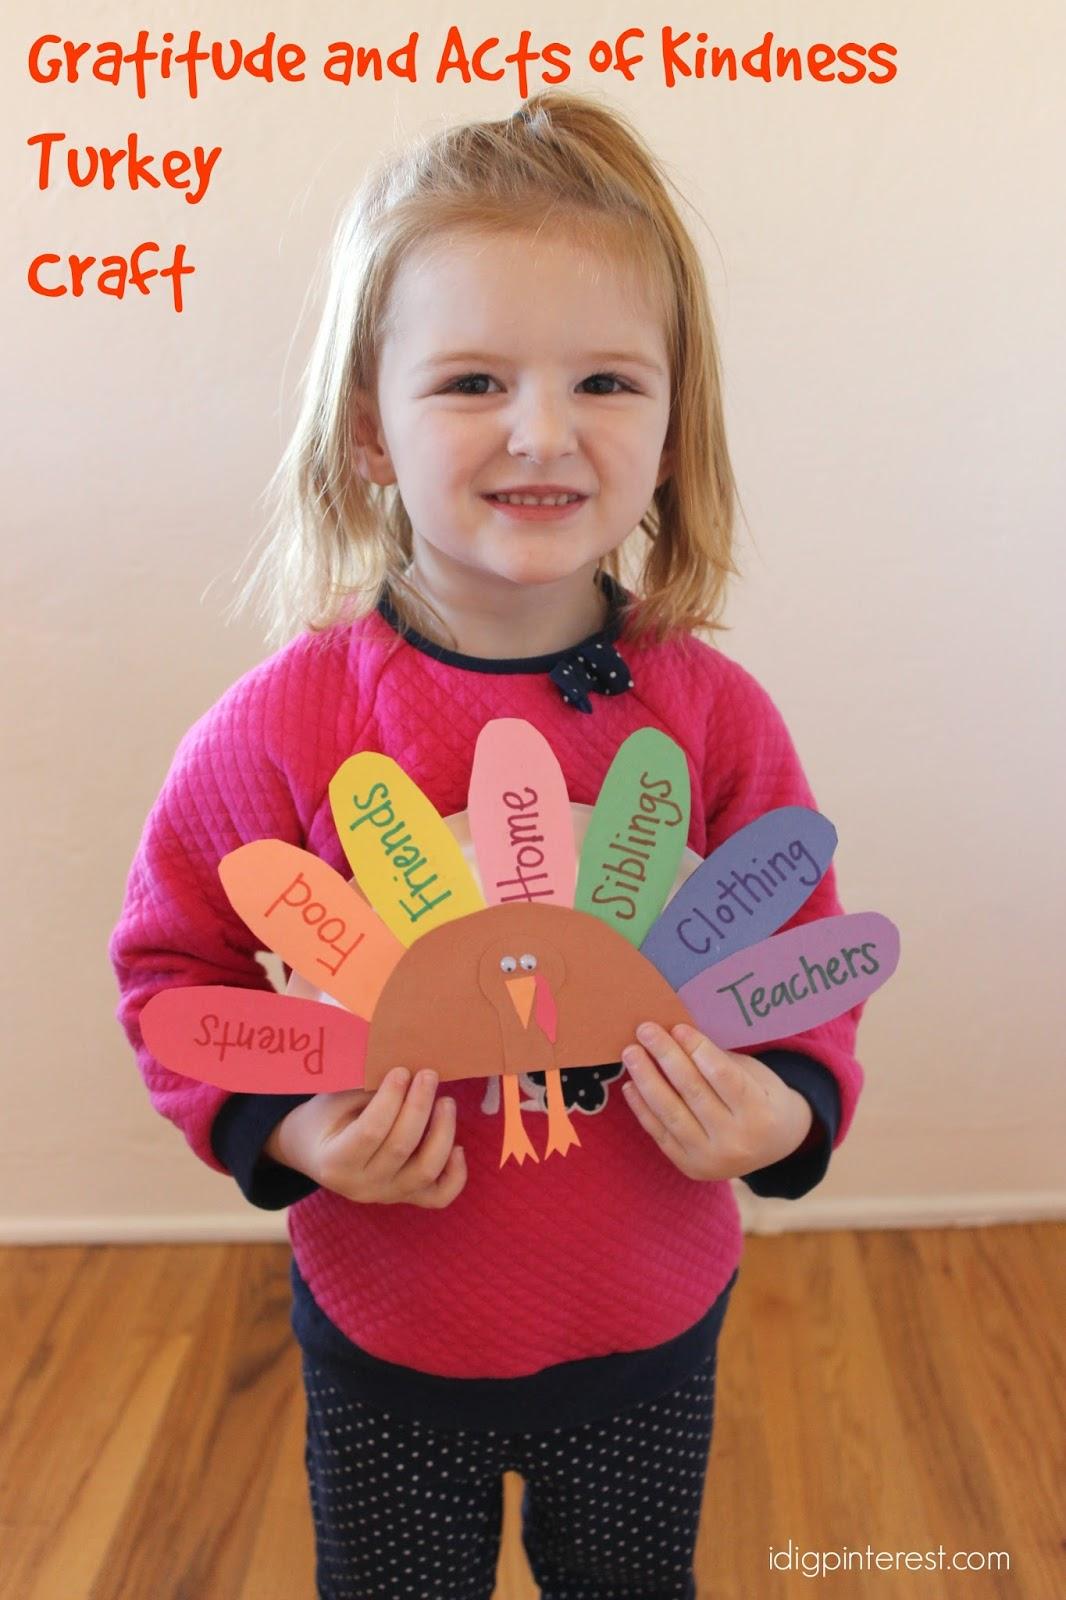 gratitude and acts of kindness kids u0027 turkey craft i dig pinterest